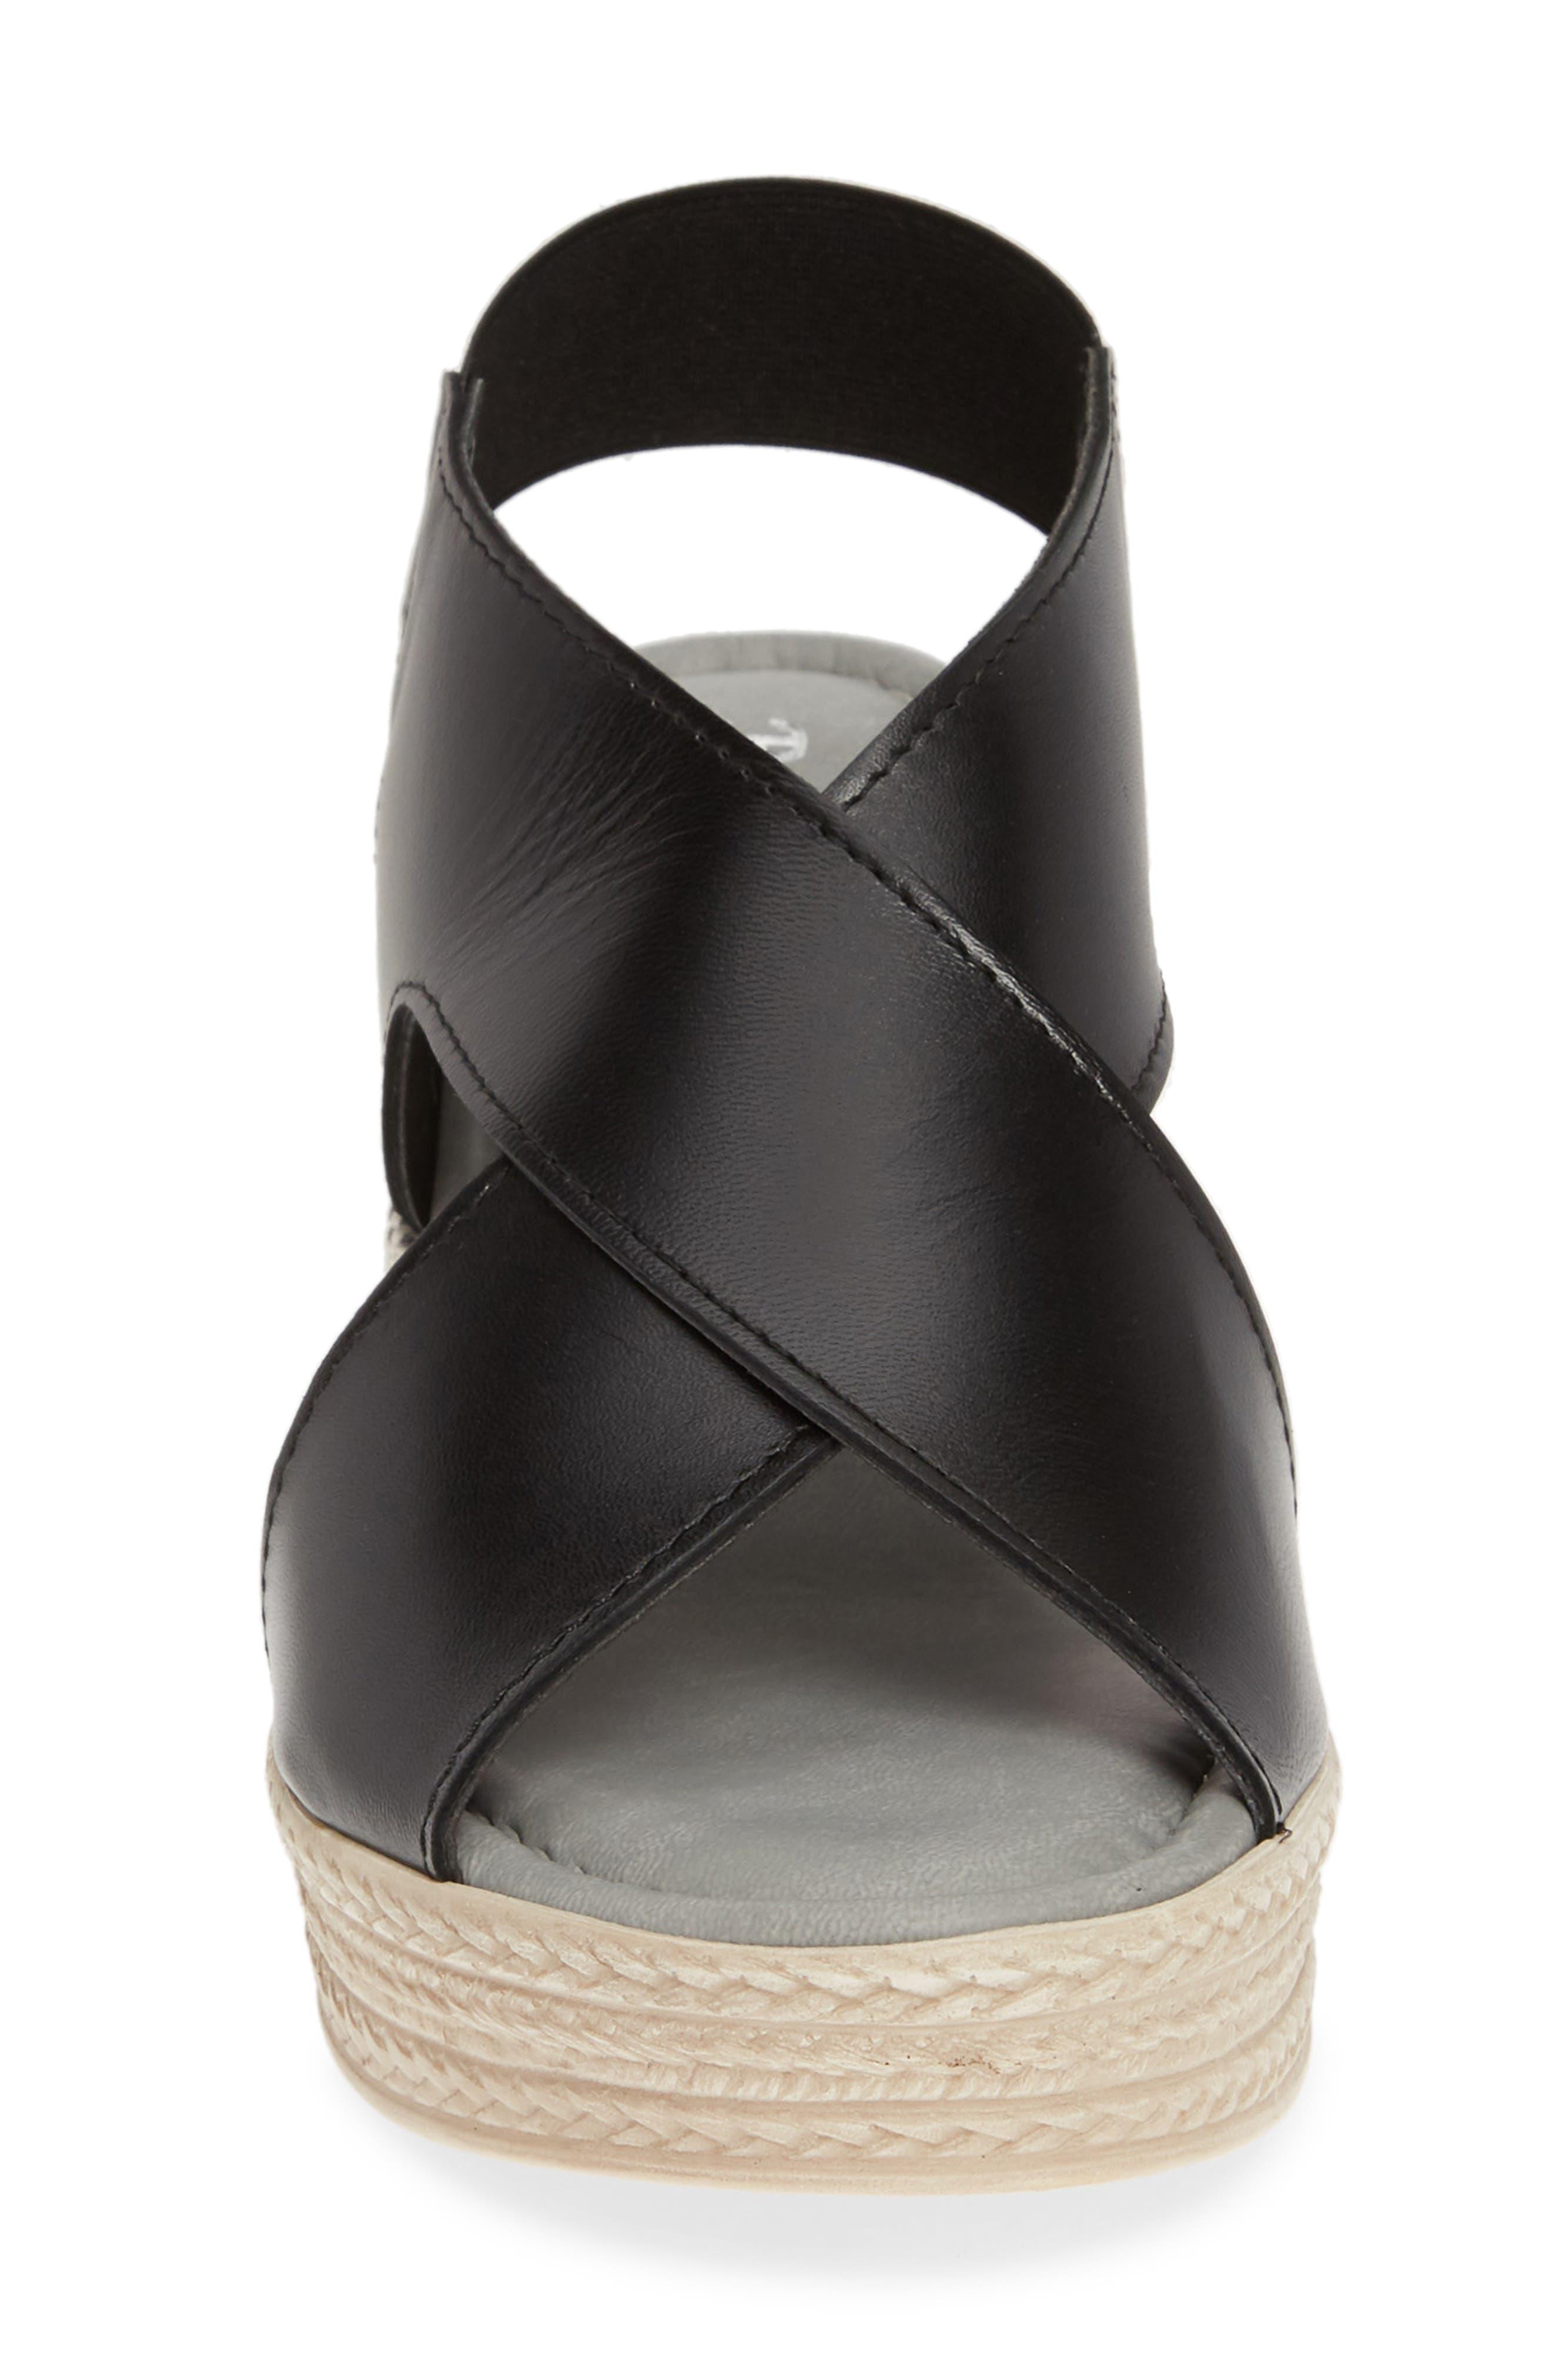 BELLA VITA, Slingback Sandal, Alternate thumbnail 4, color, BLACK ITALIAN LEATHER